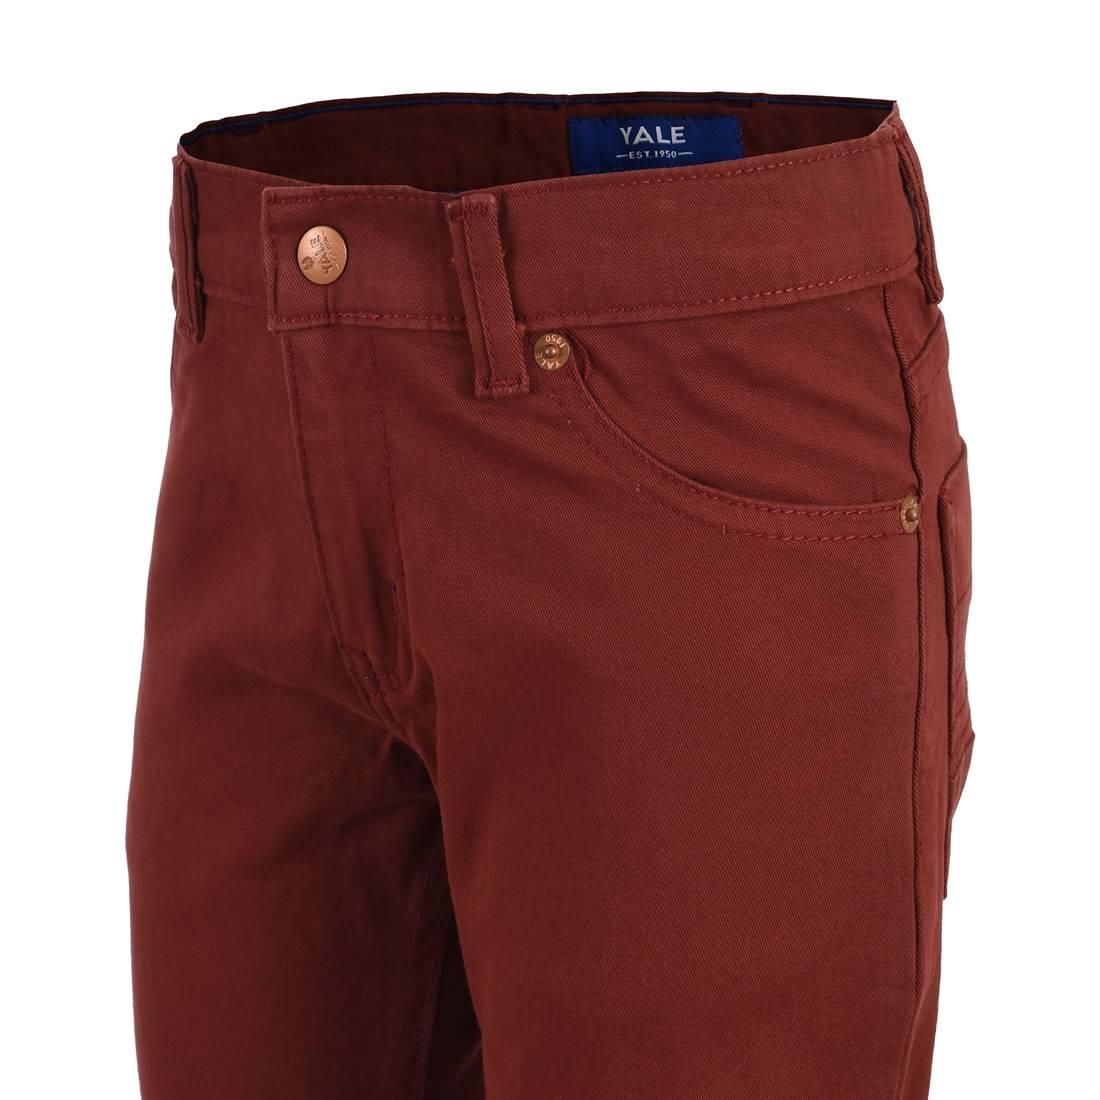 021109065473-03-Pantalon-Vaquero-Boys-Gabardina-Con-Elastano-Skinny-Fit-Cintura-Ajustable-Vino-yale